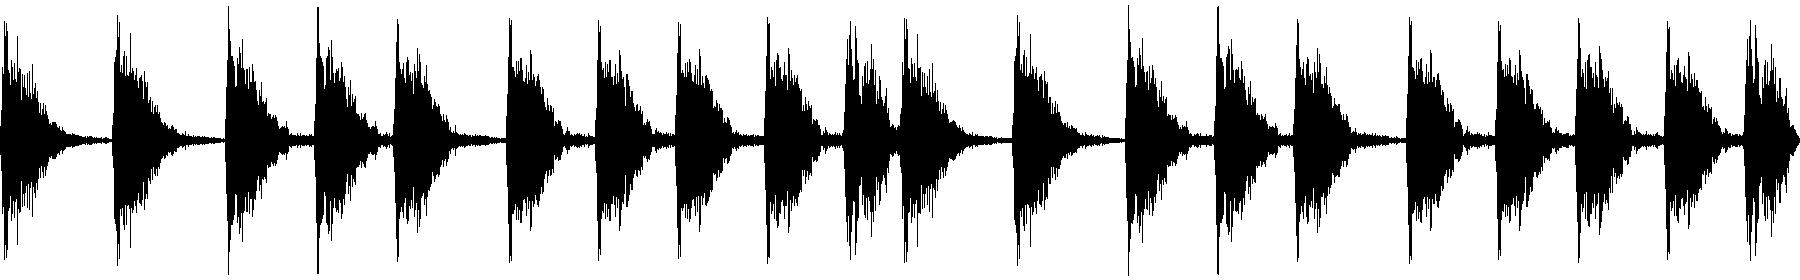 vedh melodyloop 060 cm9 dm9 fm9 120bpm